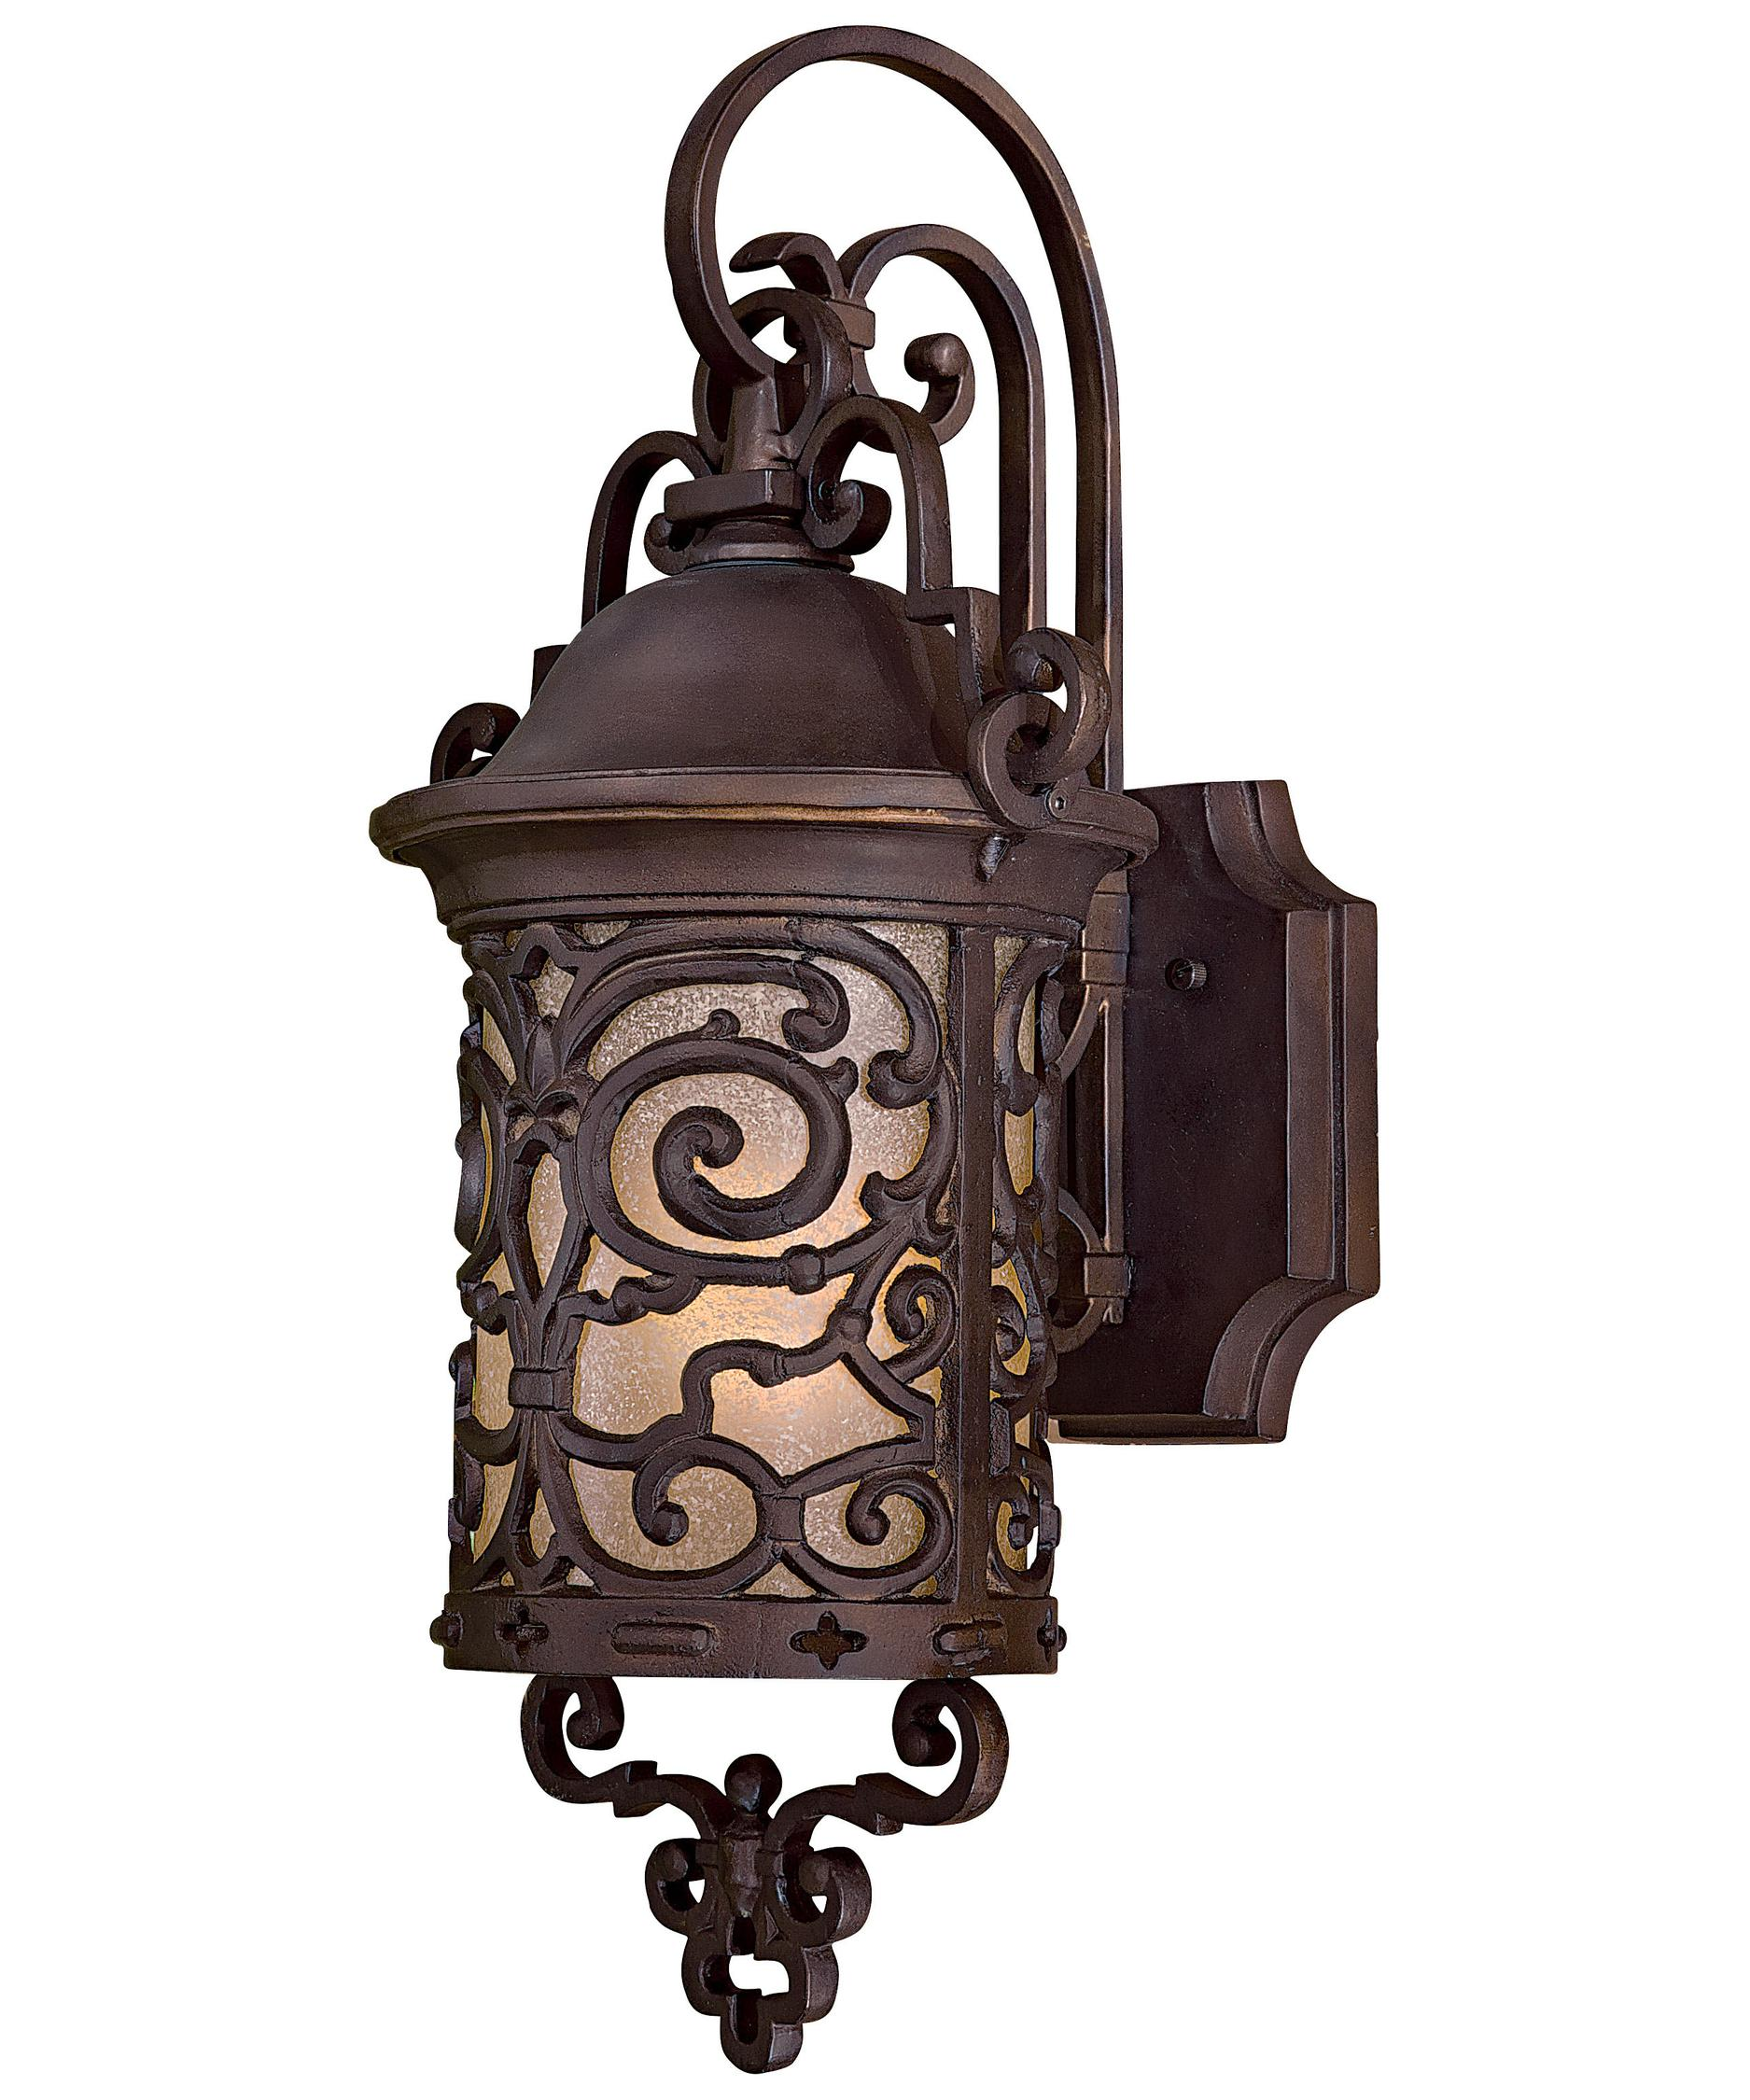 Minka Lavery 9192 Chelsea Road 11 Inch Wide 1 Light Outdoor Wall Light |  Capitol Lighting 1 800lighting.com